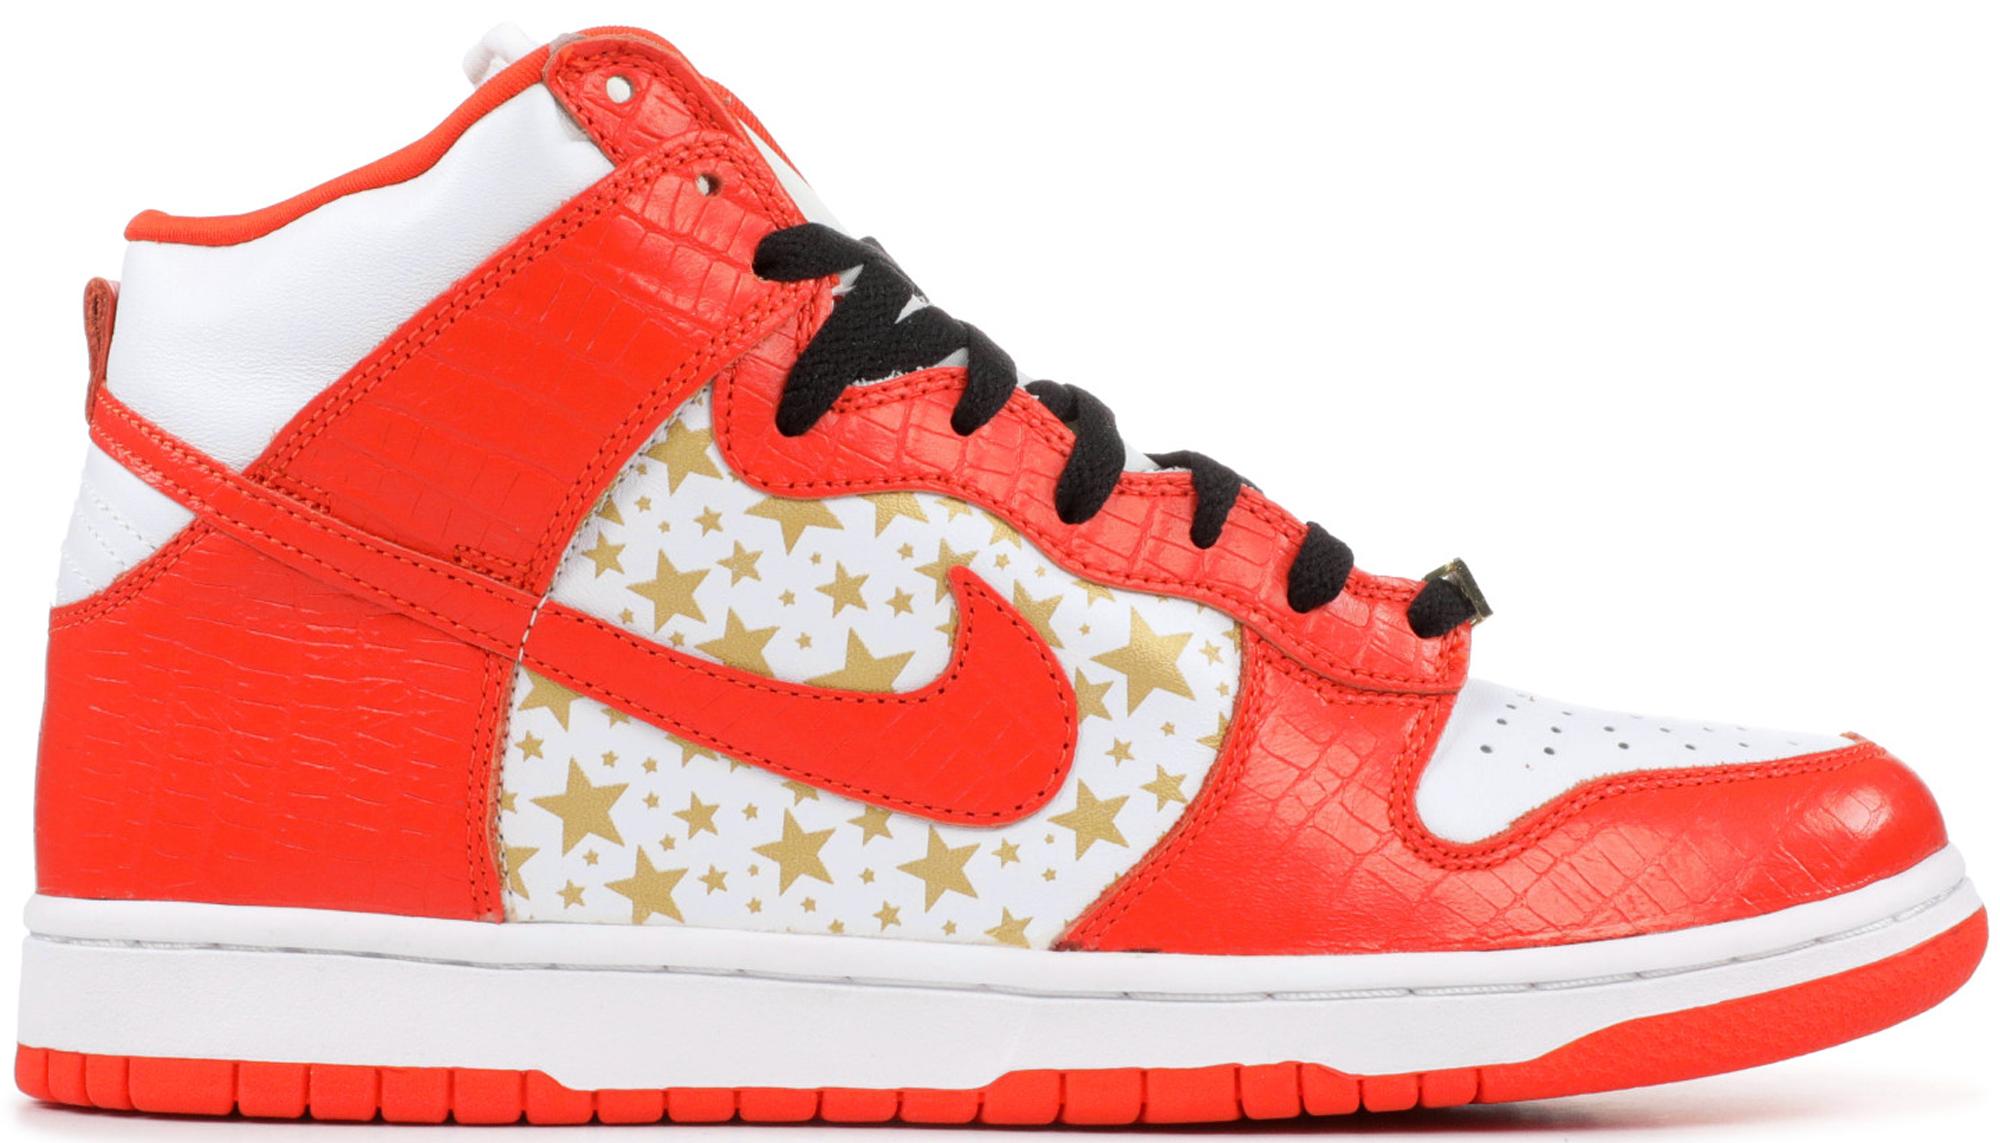 Nike SB Dunk High Supreme Orange